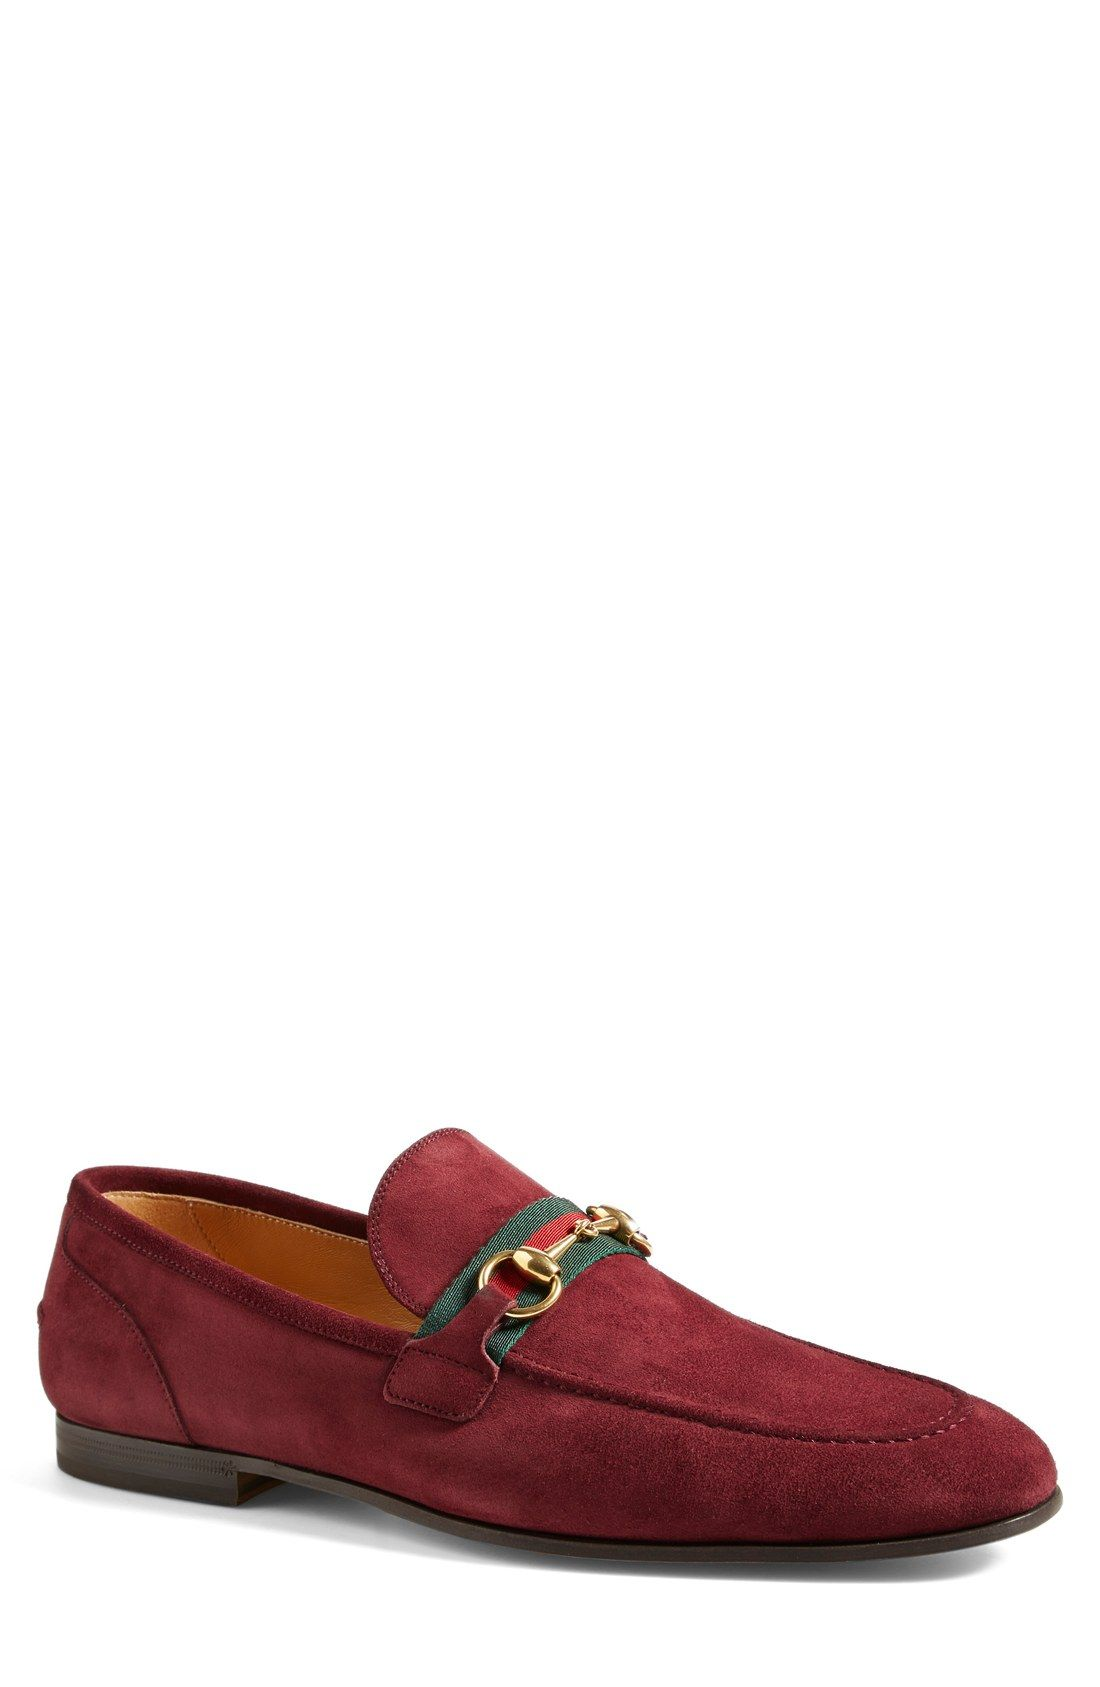 9448a13d5e1 Gucci  Elanor  Bit Loafer